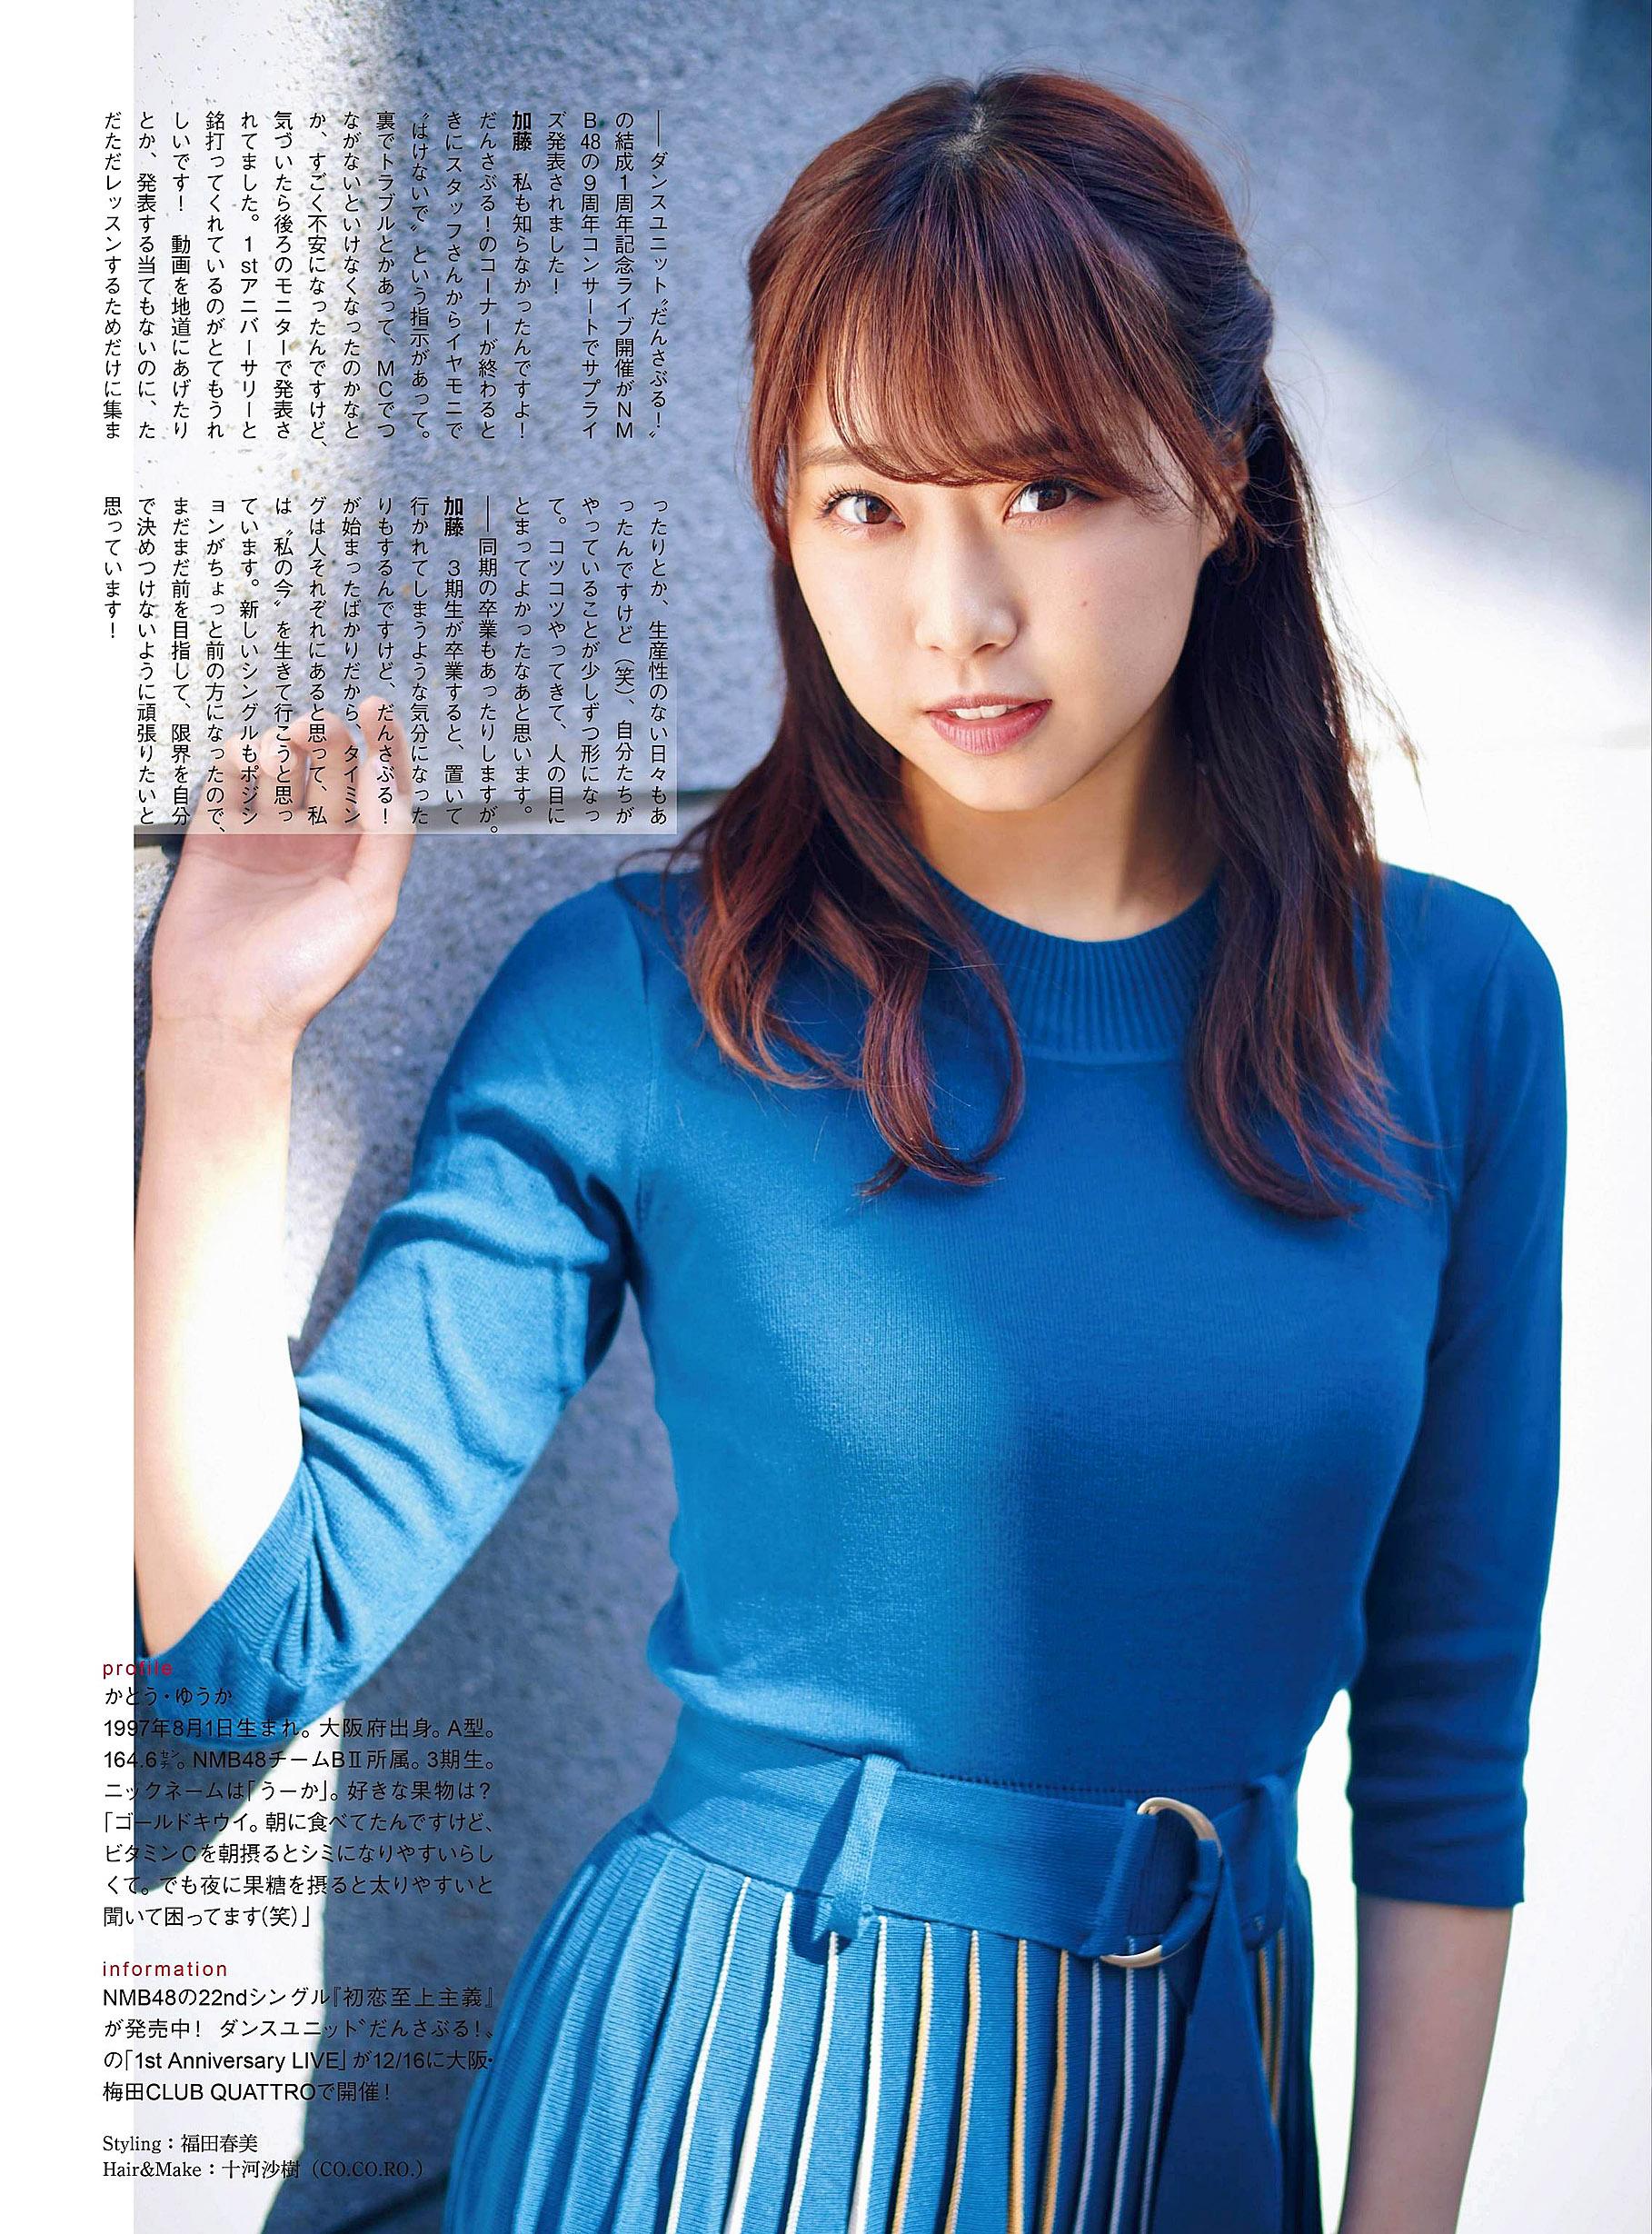 Yuuka Kato NMB48 EnTame 2001 07.jpg